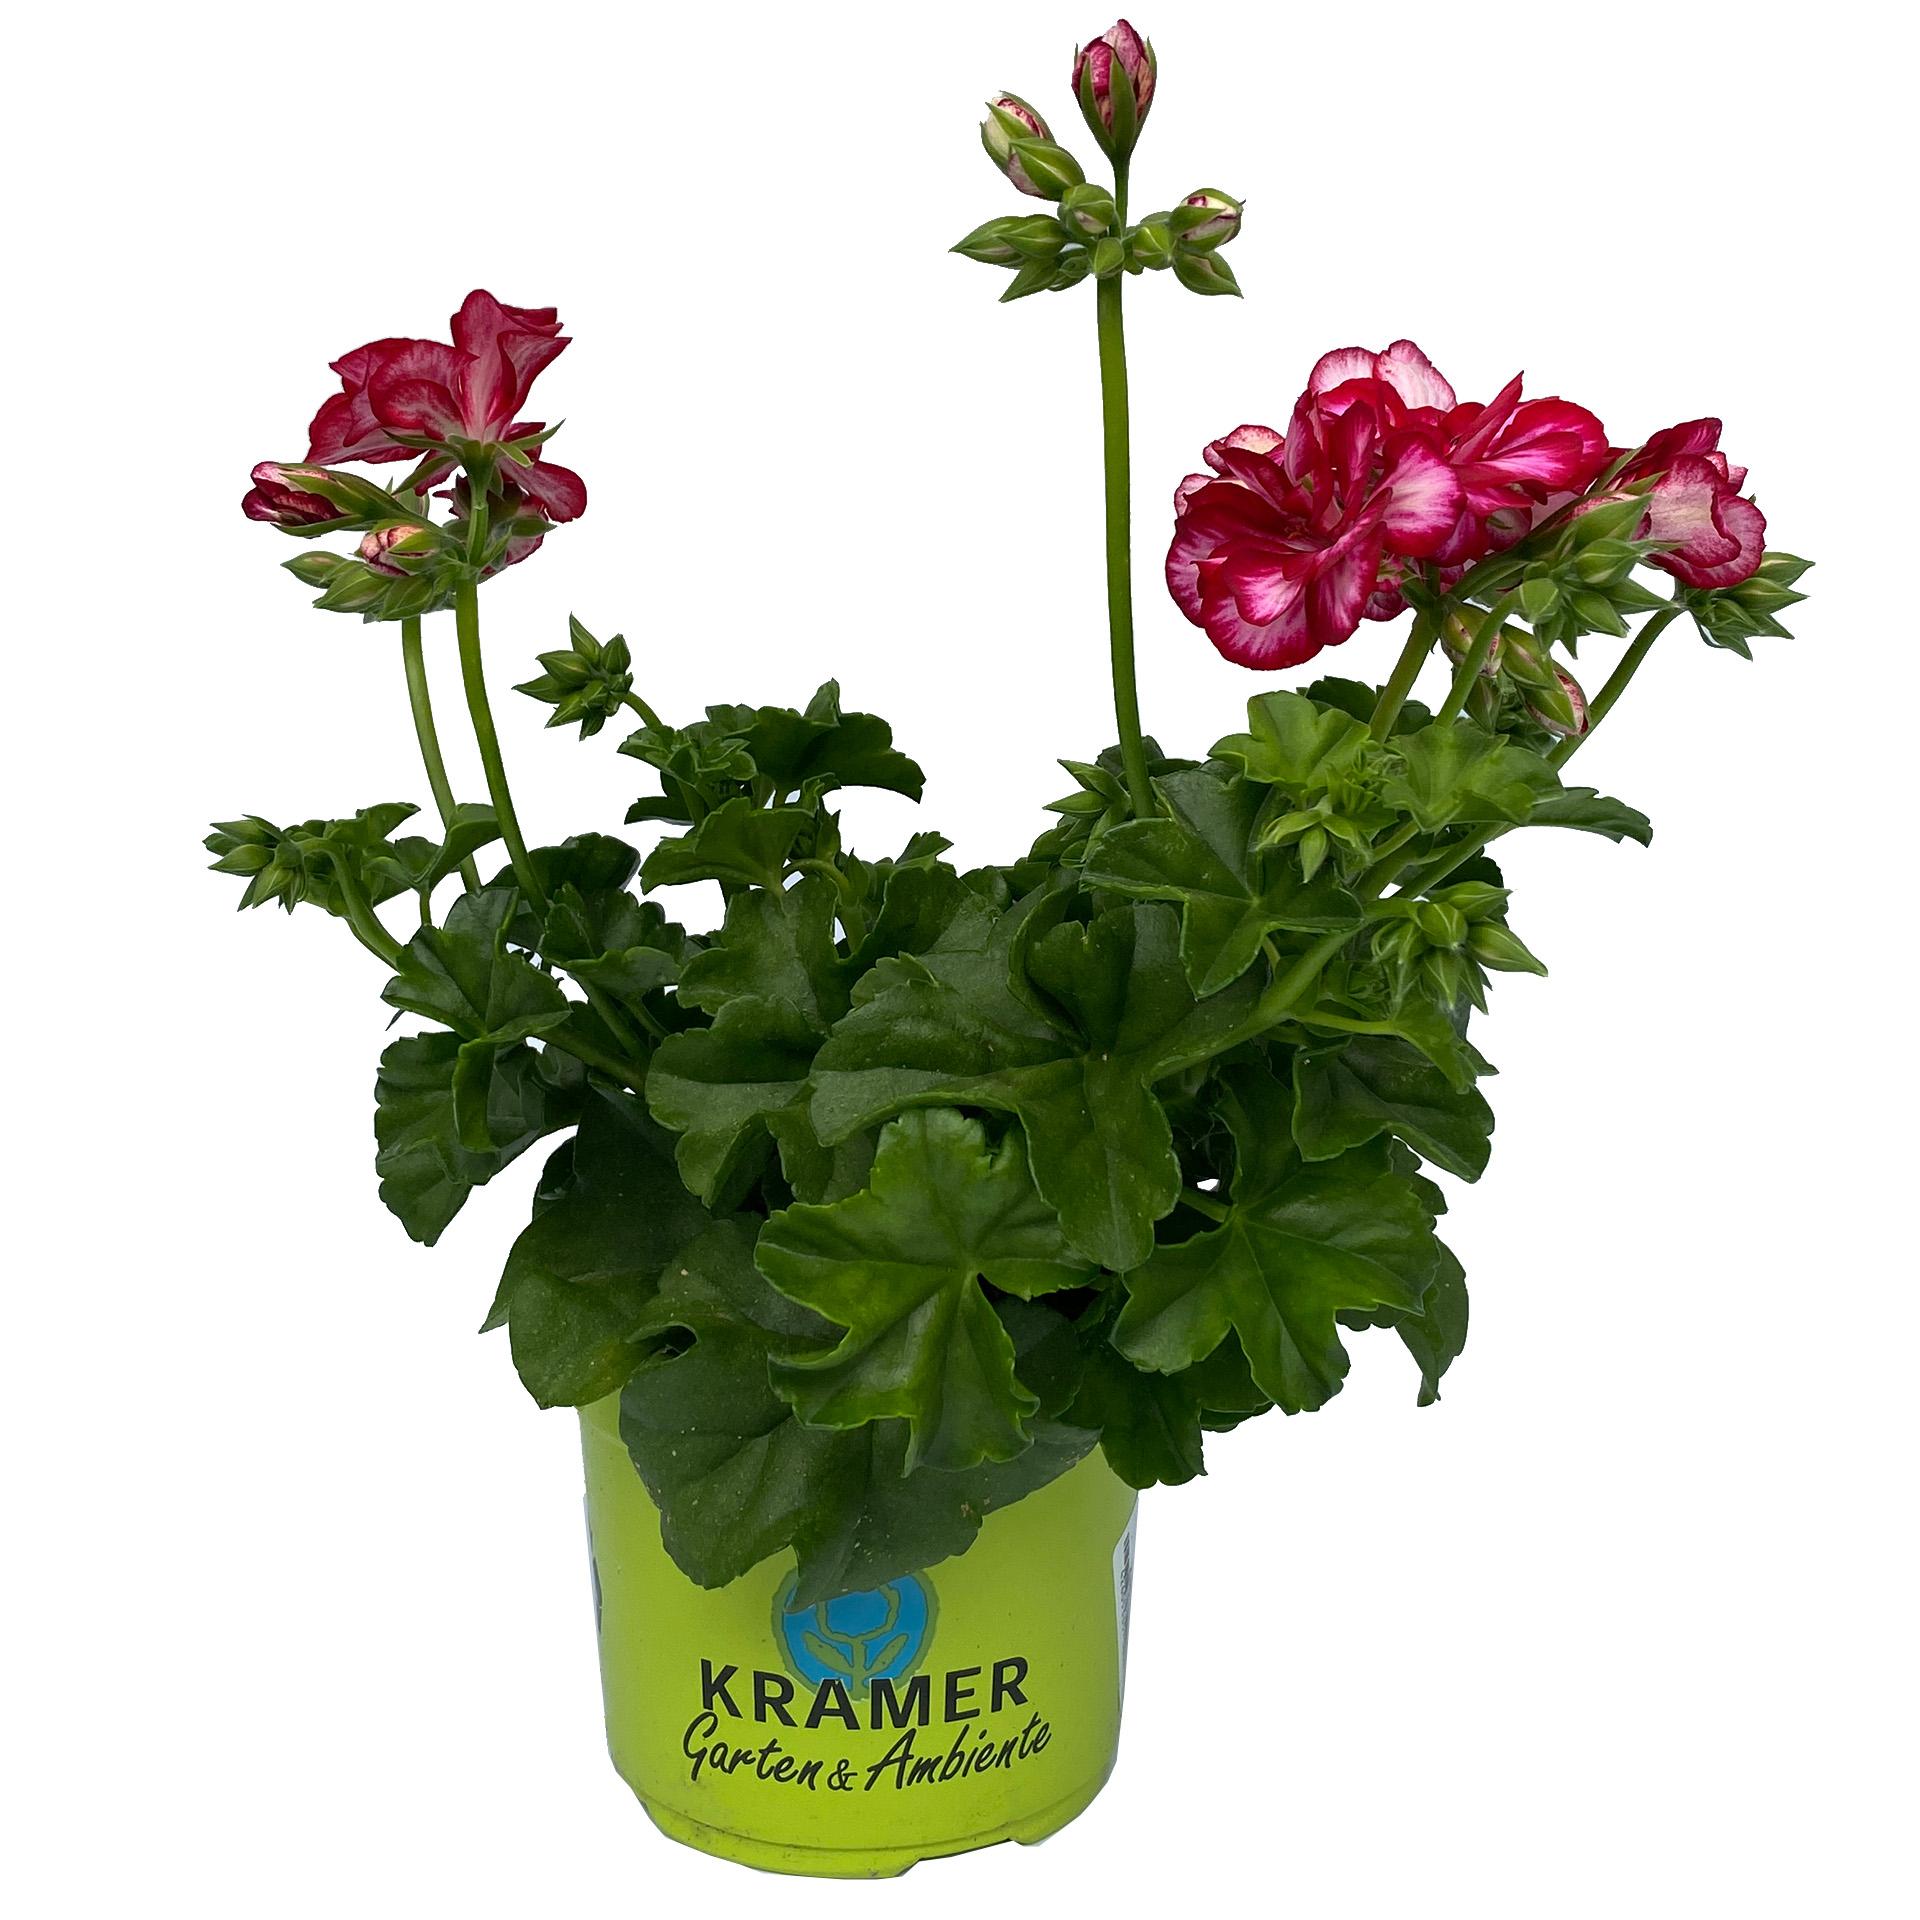 Geranie hängend - Pelargonium peltatum 'Medio Lollipop Mariska' samtrot, 12cm Topf